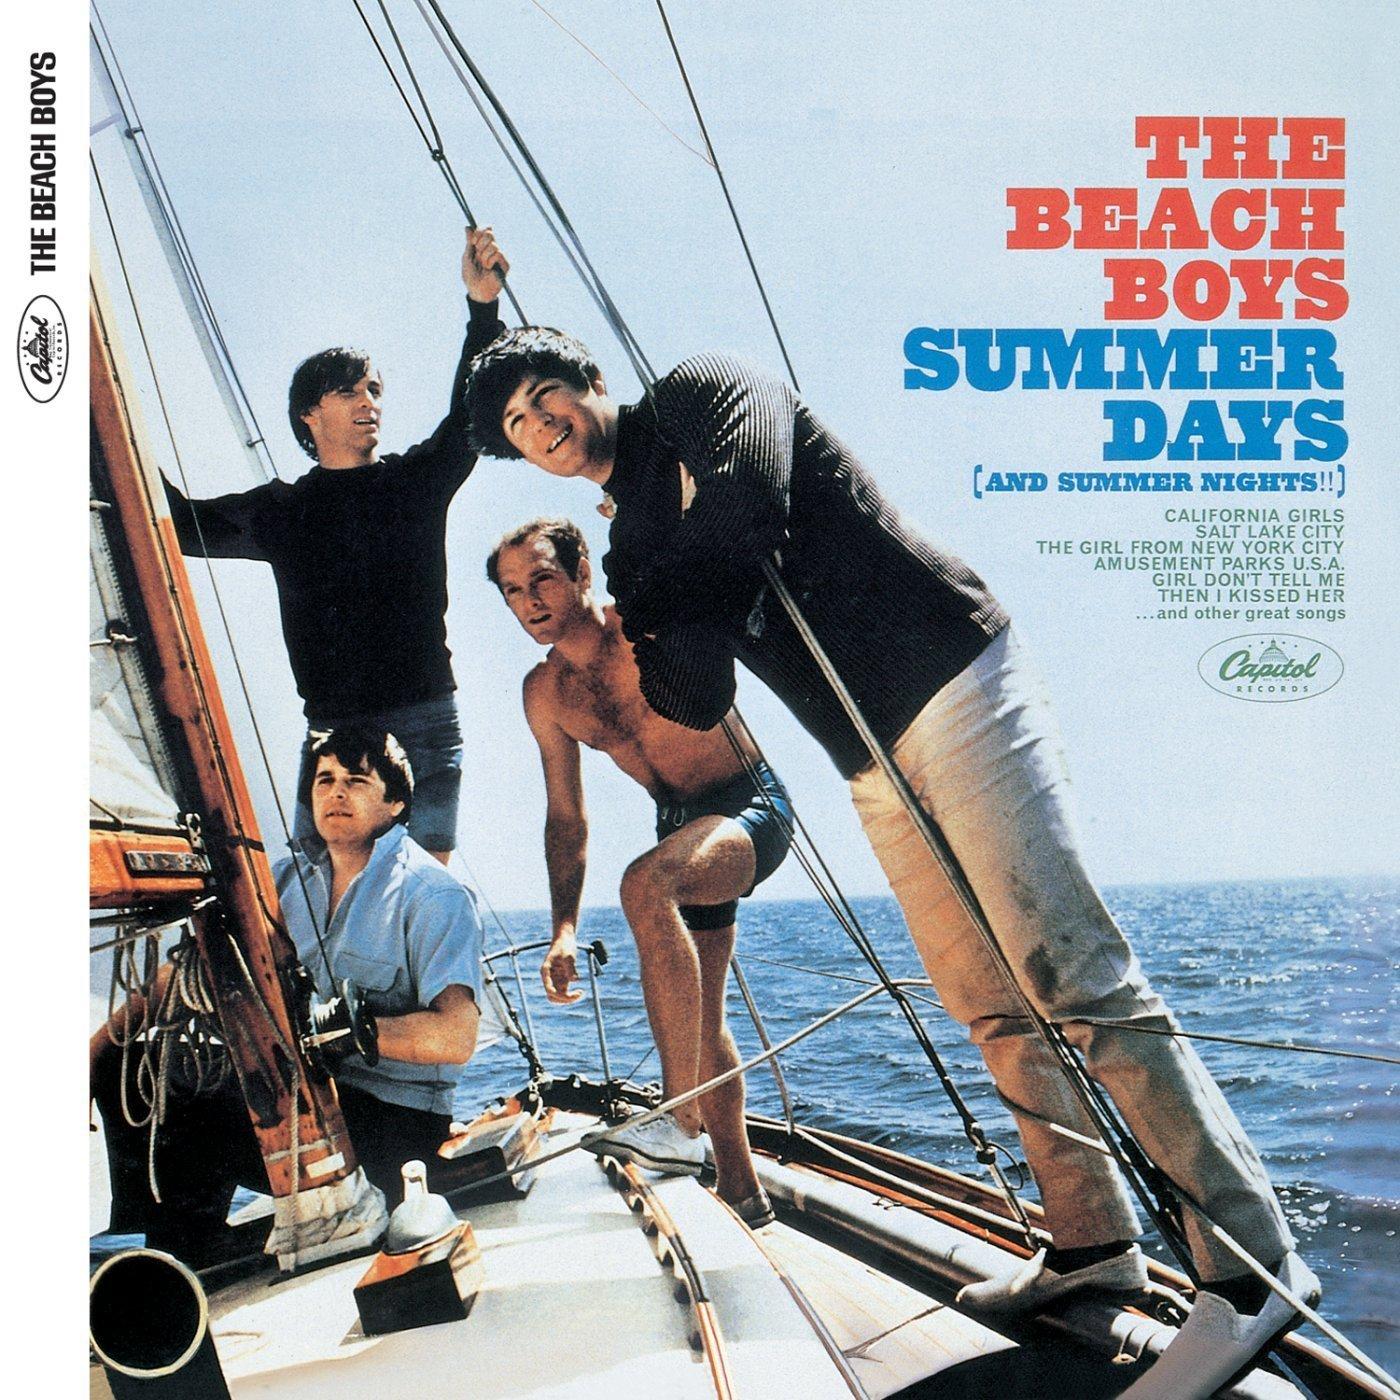 SUMMER DAYS (and summer nights!!) / THE BEACH BOYSのジャケット